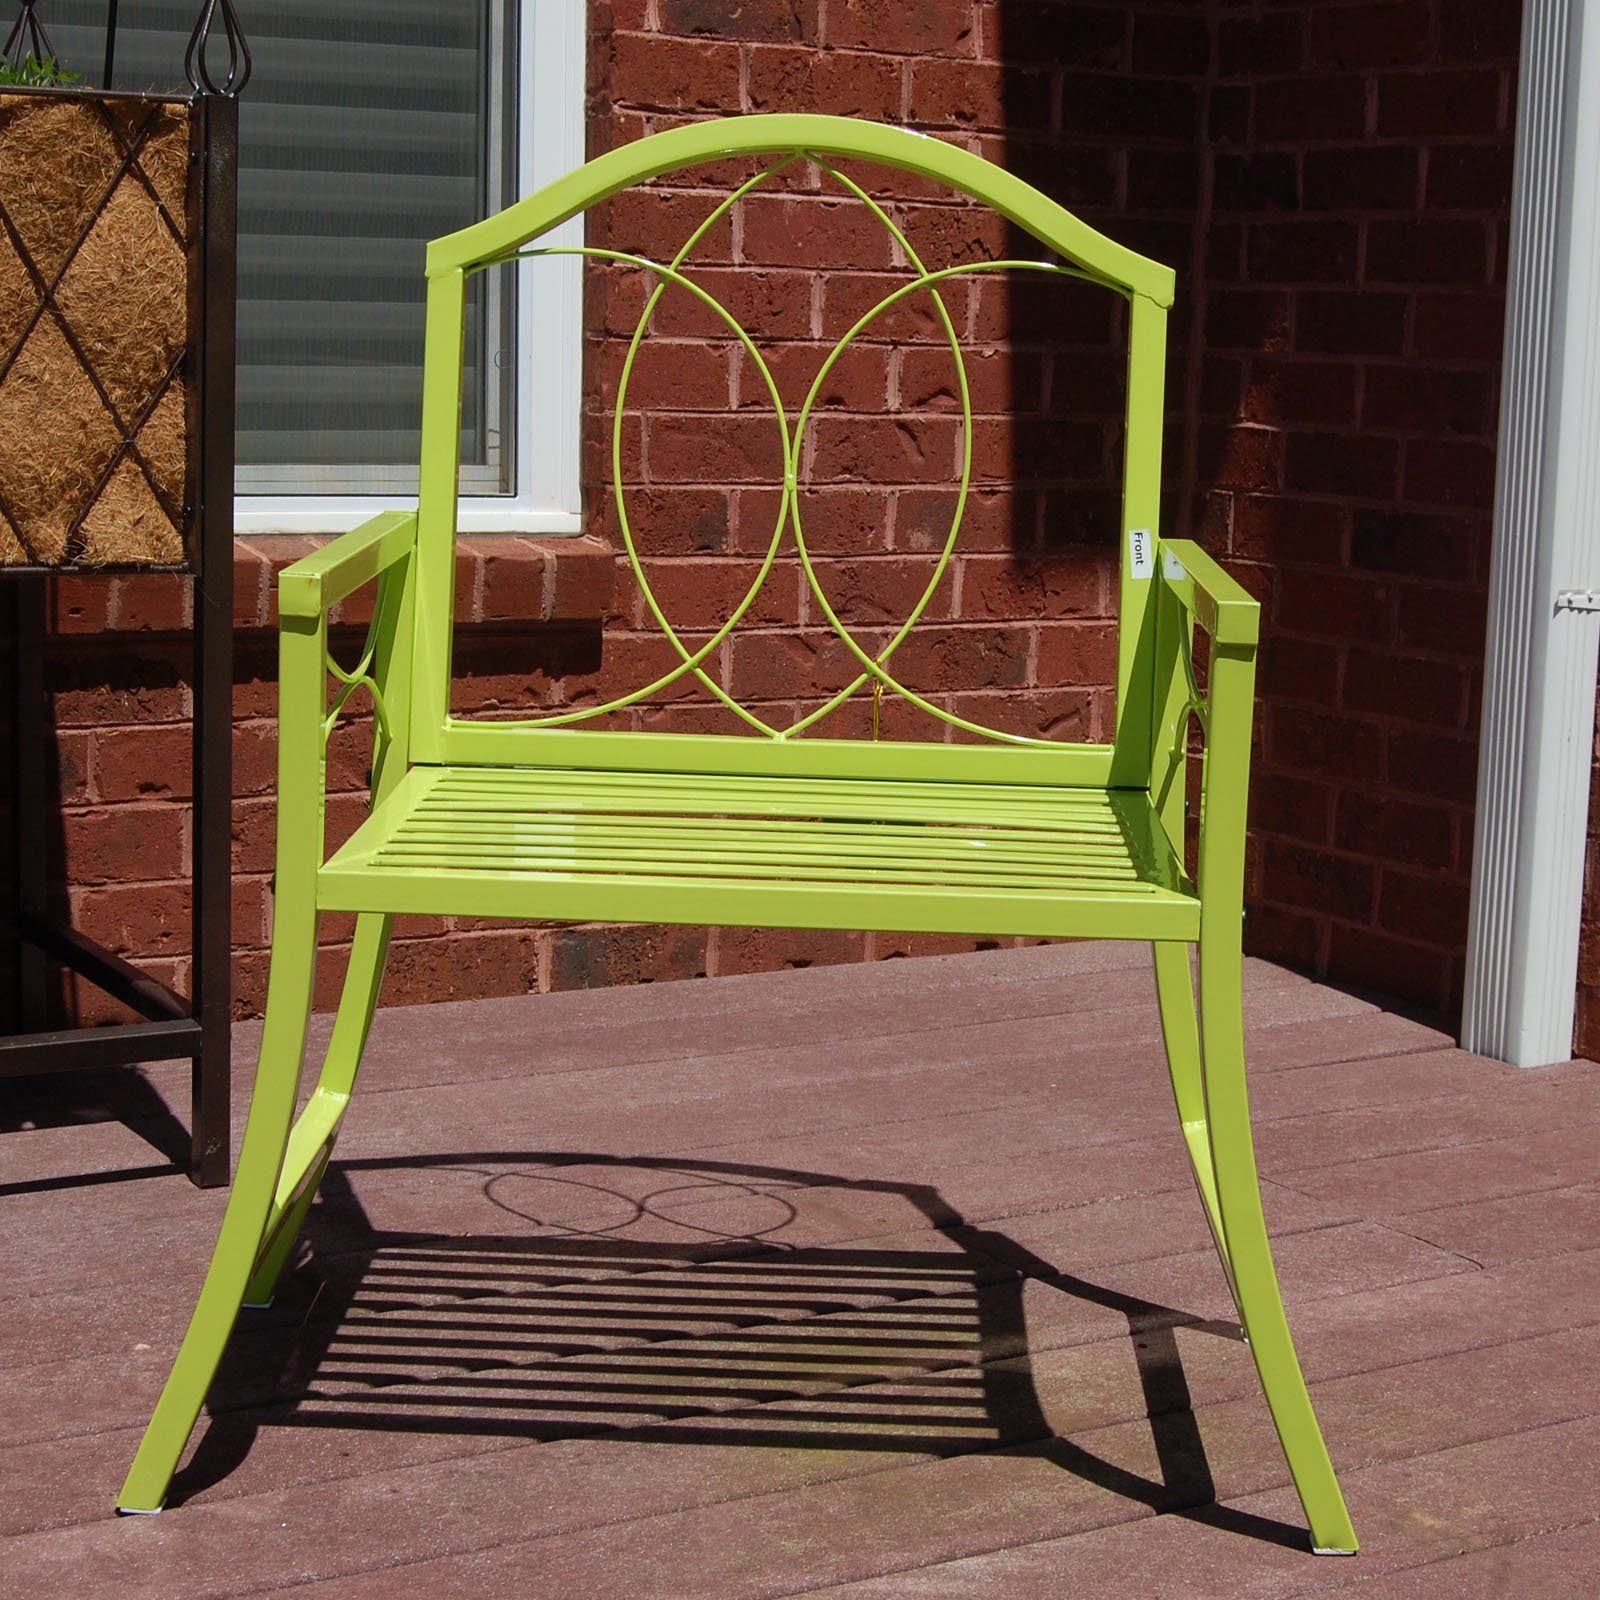 Austram Griffith Creek Designs Patio Arm Chair 30 in.